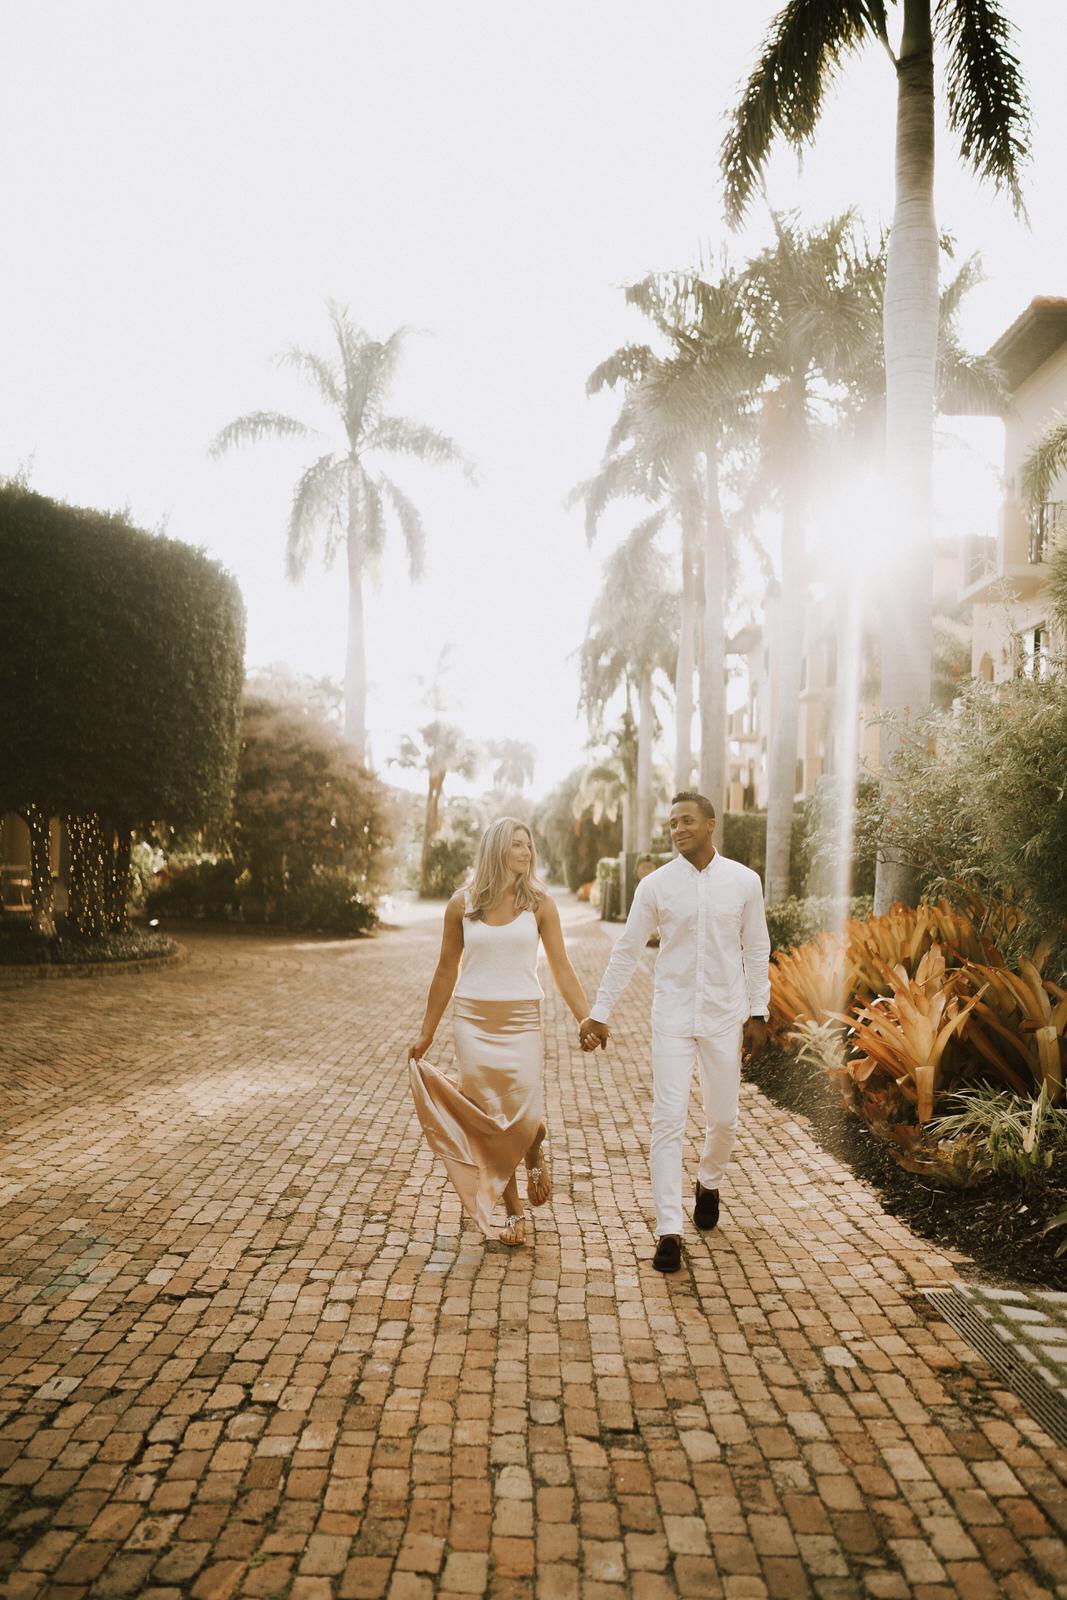 Naples 5th Ave Engagement Photos- Michelle Gonzalez Photography- Michele + Troy-104.JPG